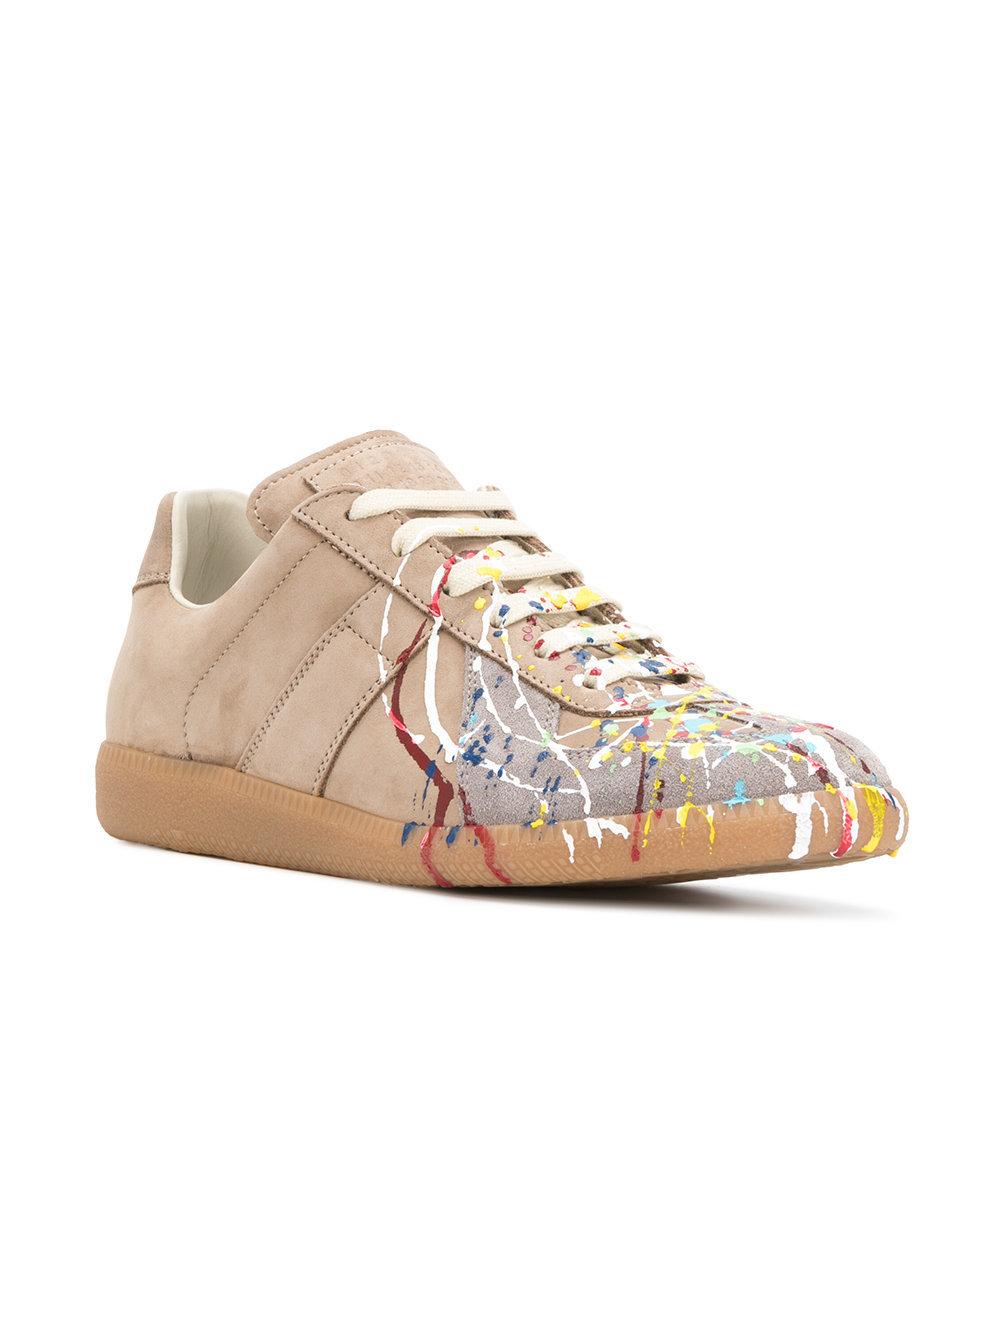 Maison Margiela Paint Splatter Sneakers